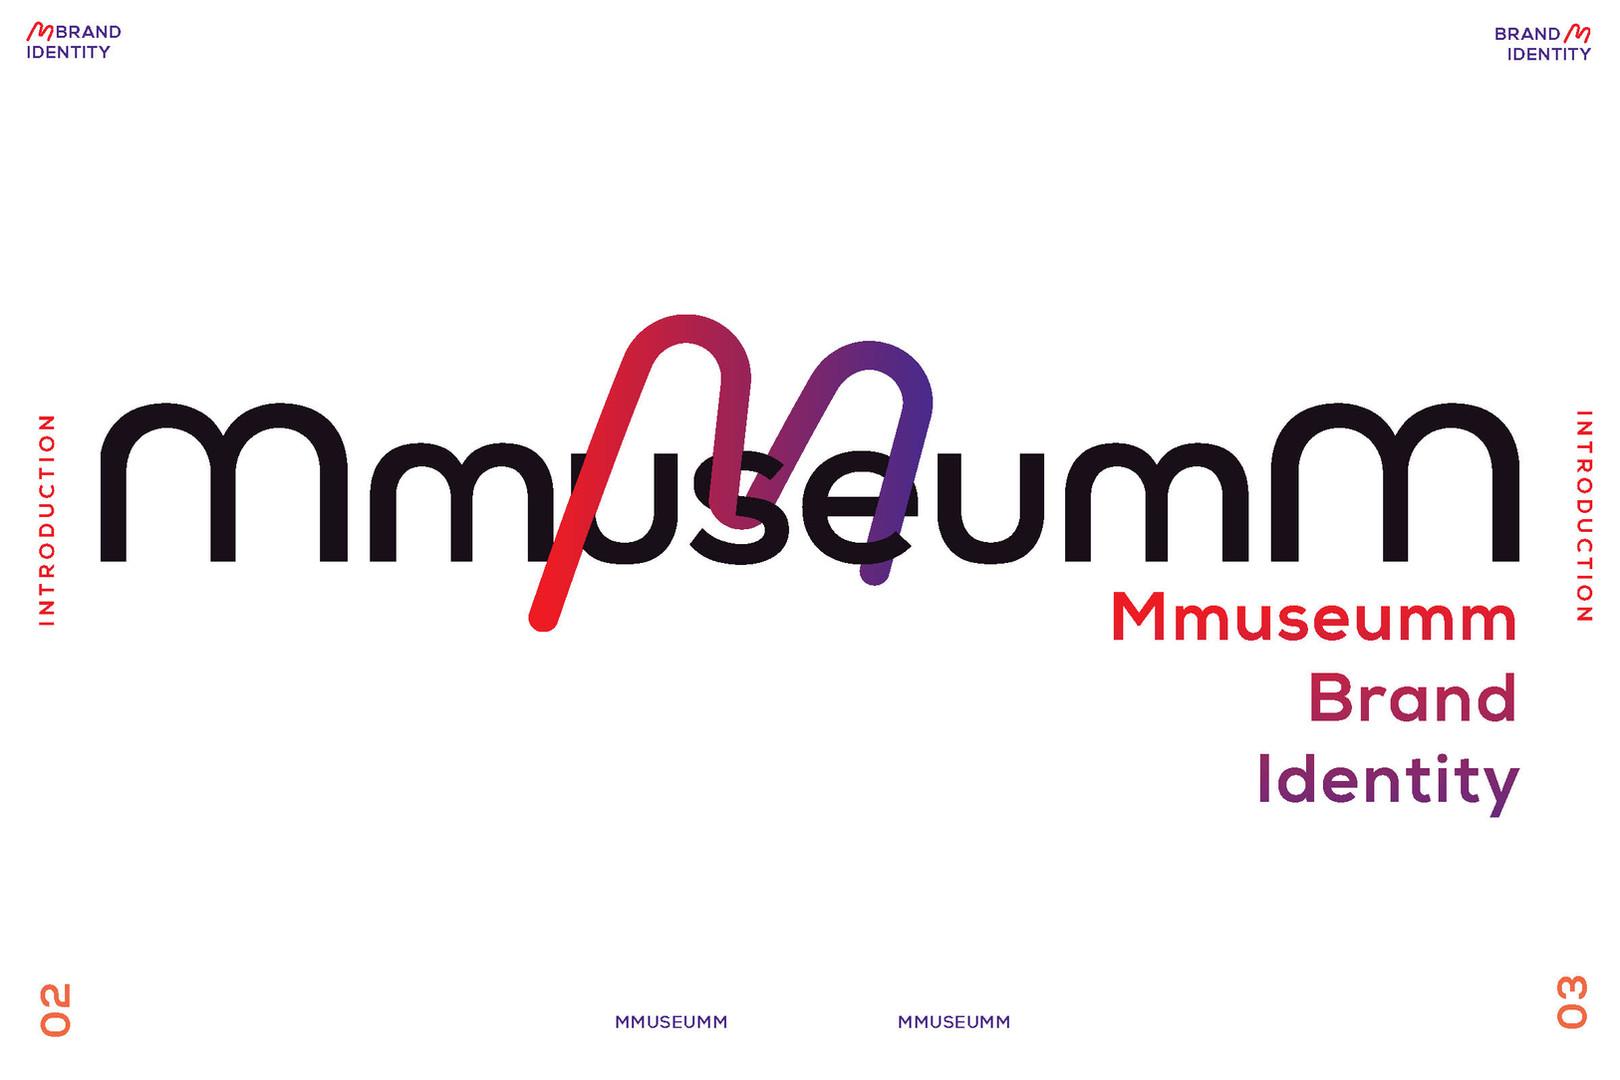 Mmuseumm Identity, Rowan Vogel